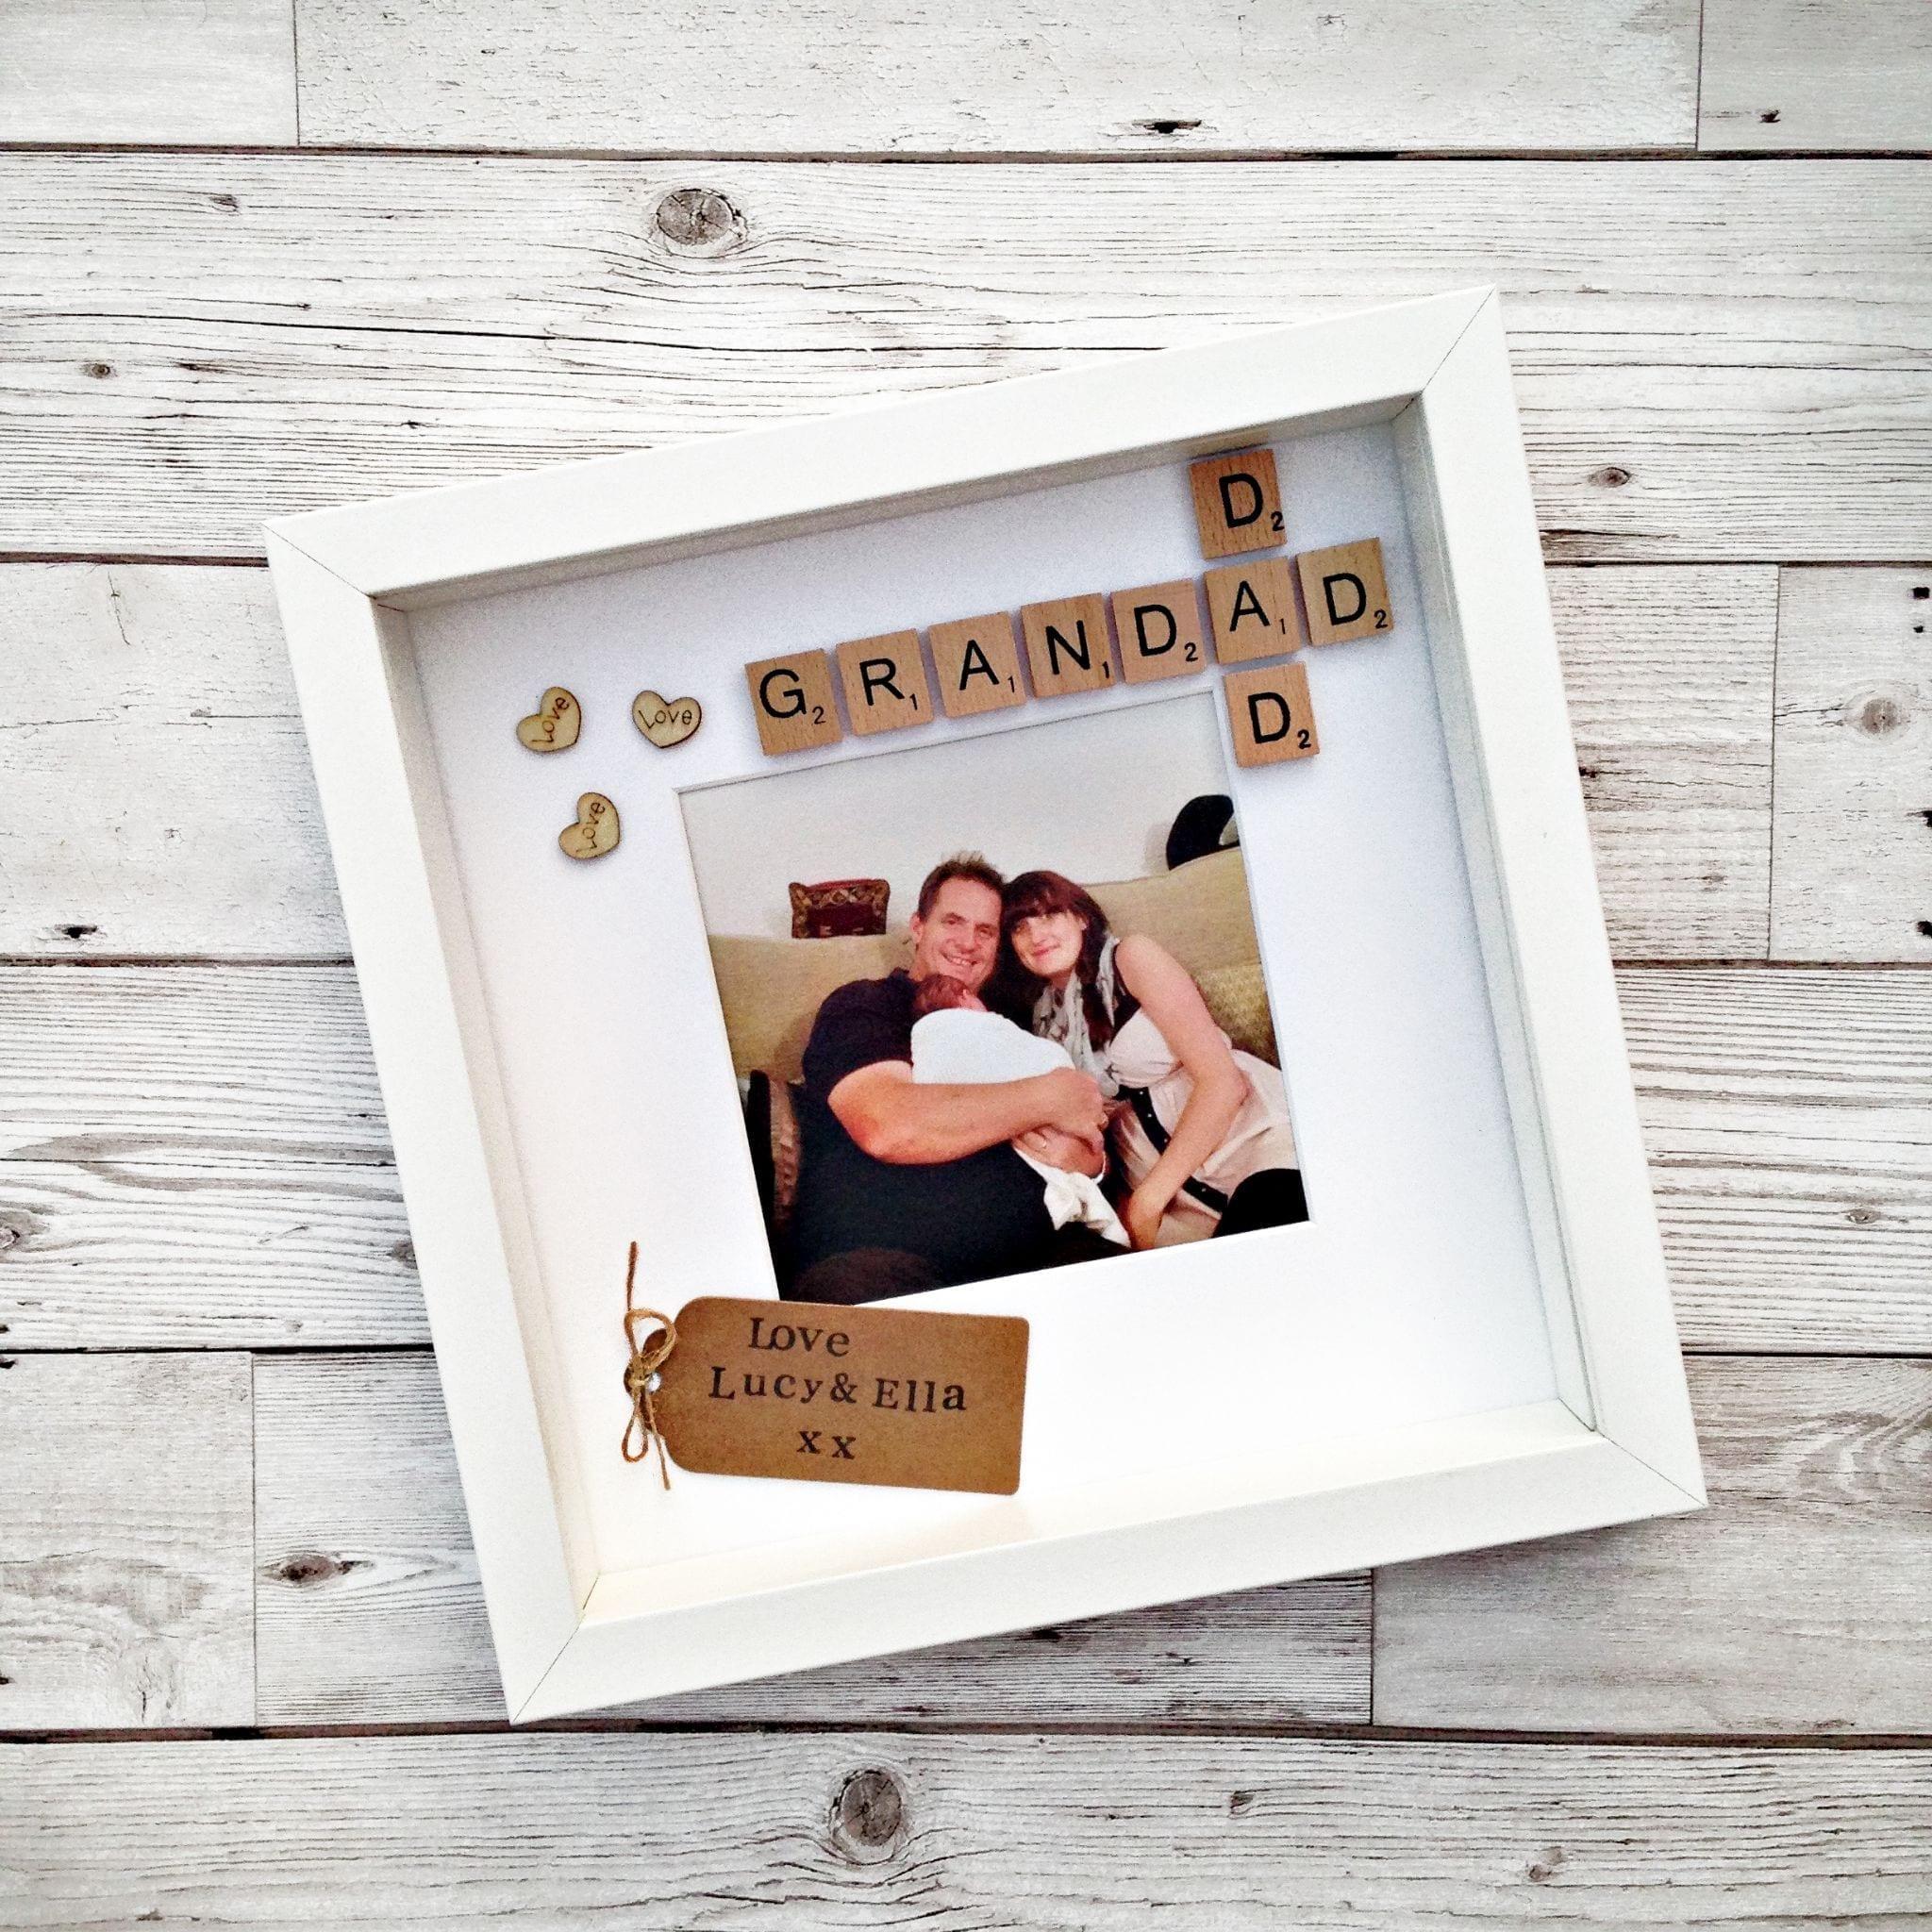 Dad and Grandad Scrabble Frame   Love Unique Personal